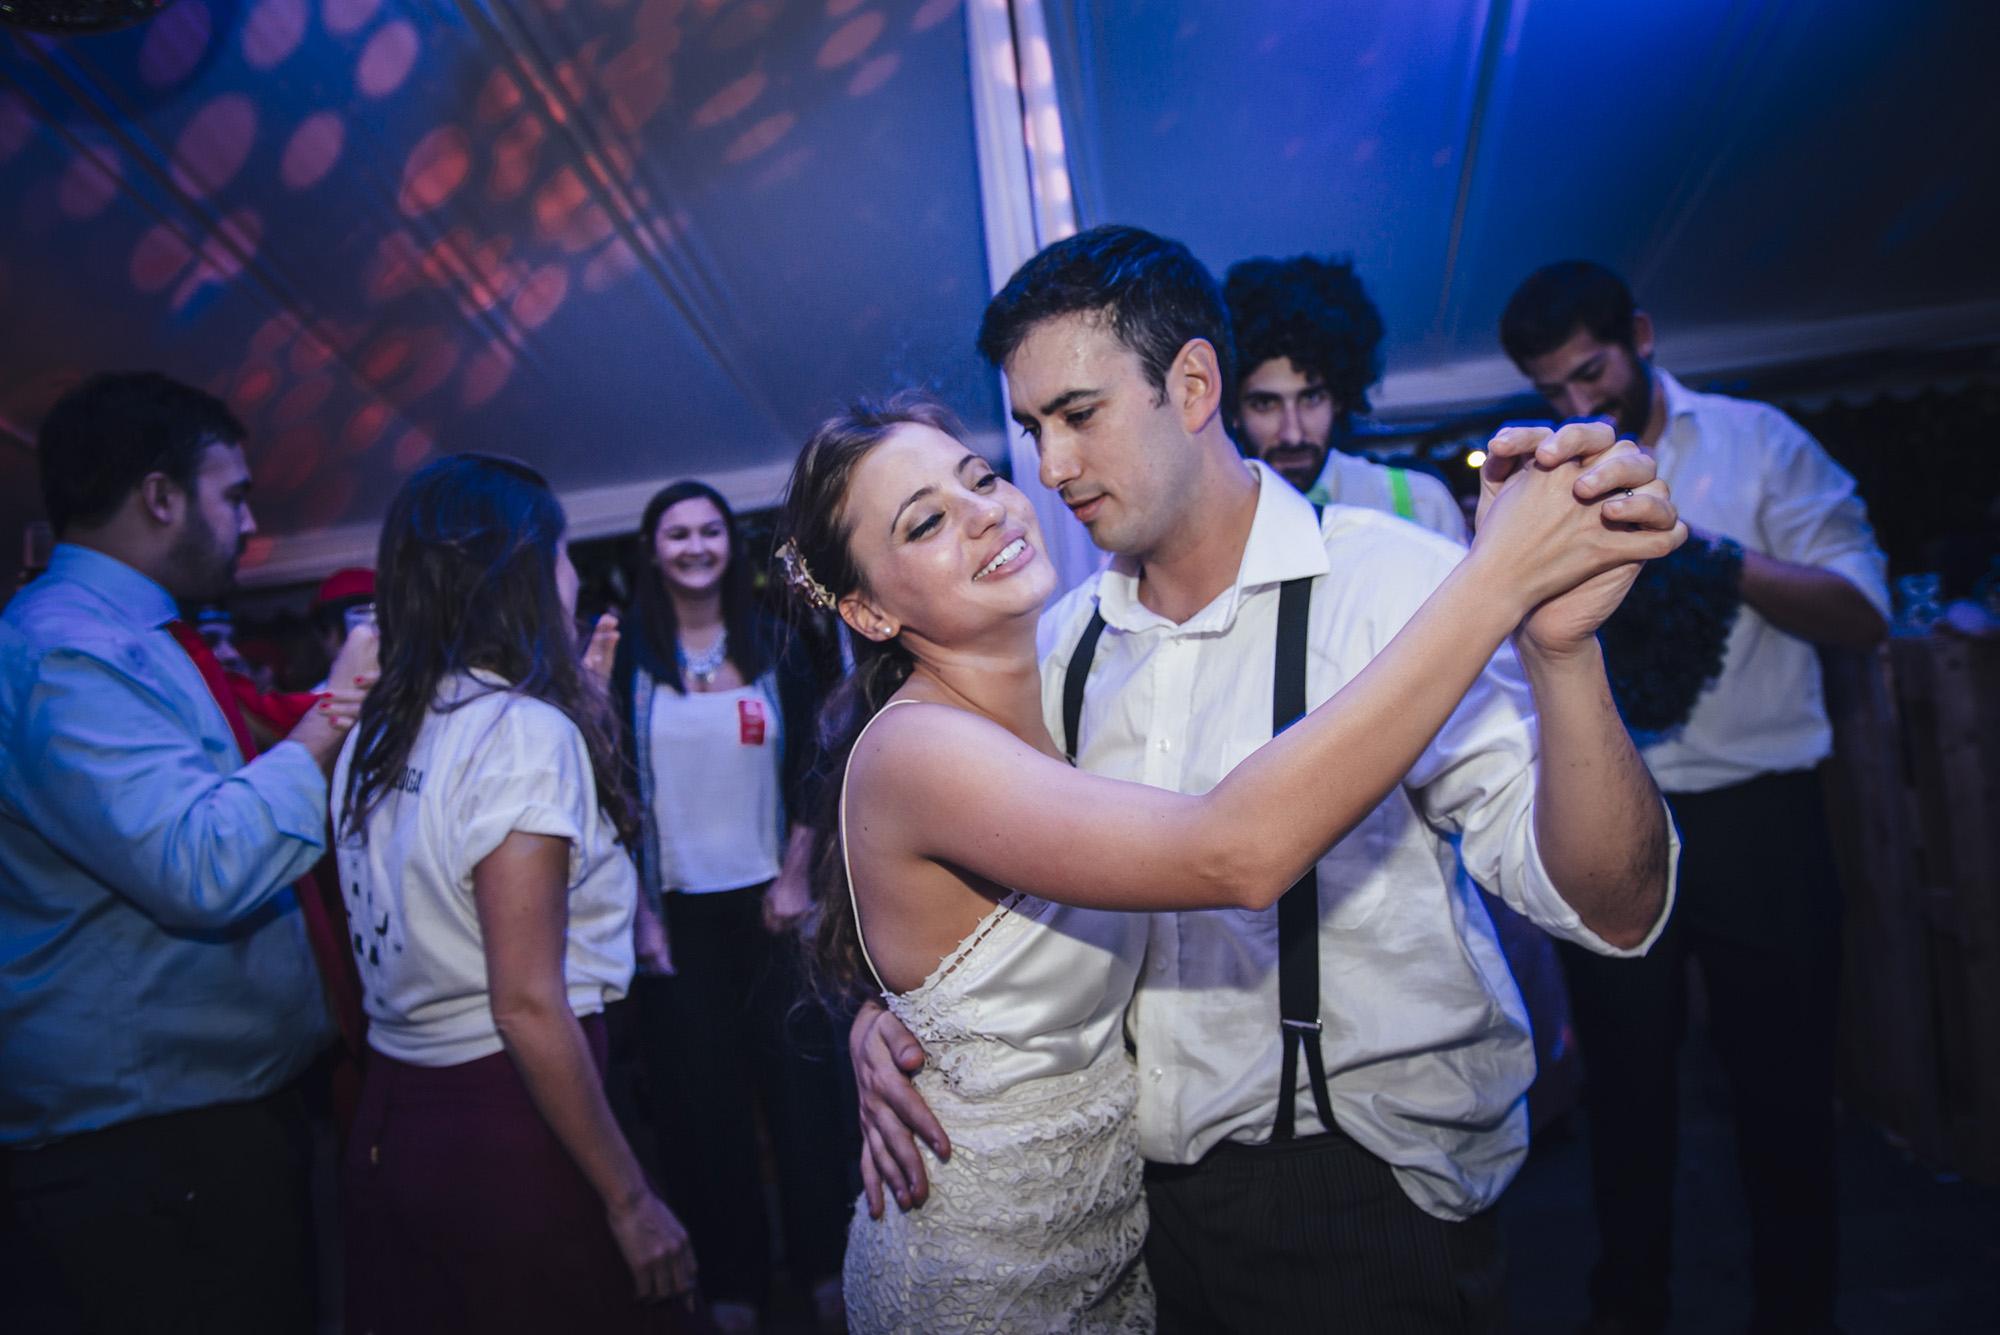 patricia-riba-casamiento-montevideo-uruguay-lindolfo-84